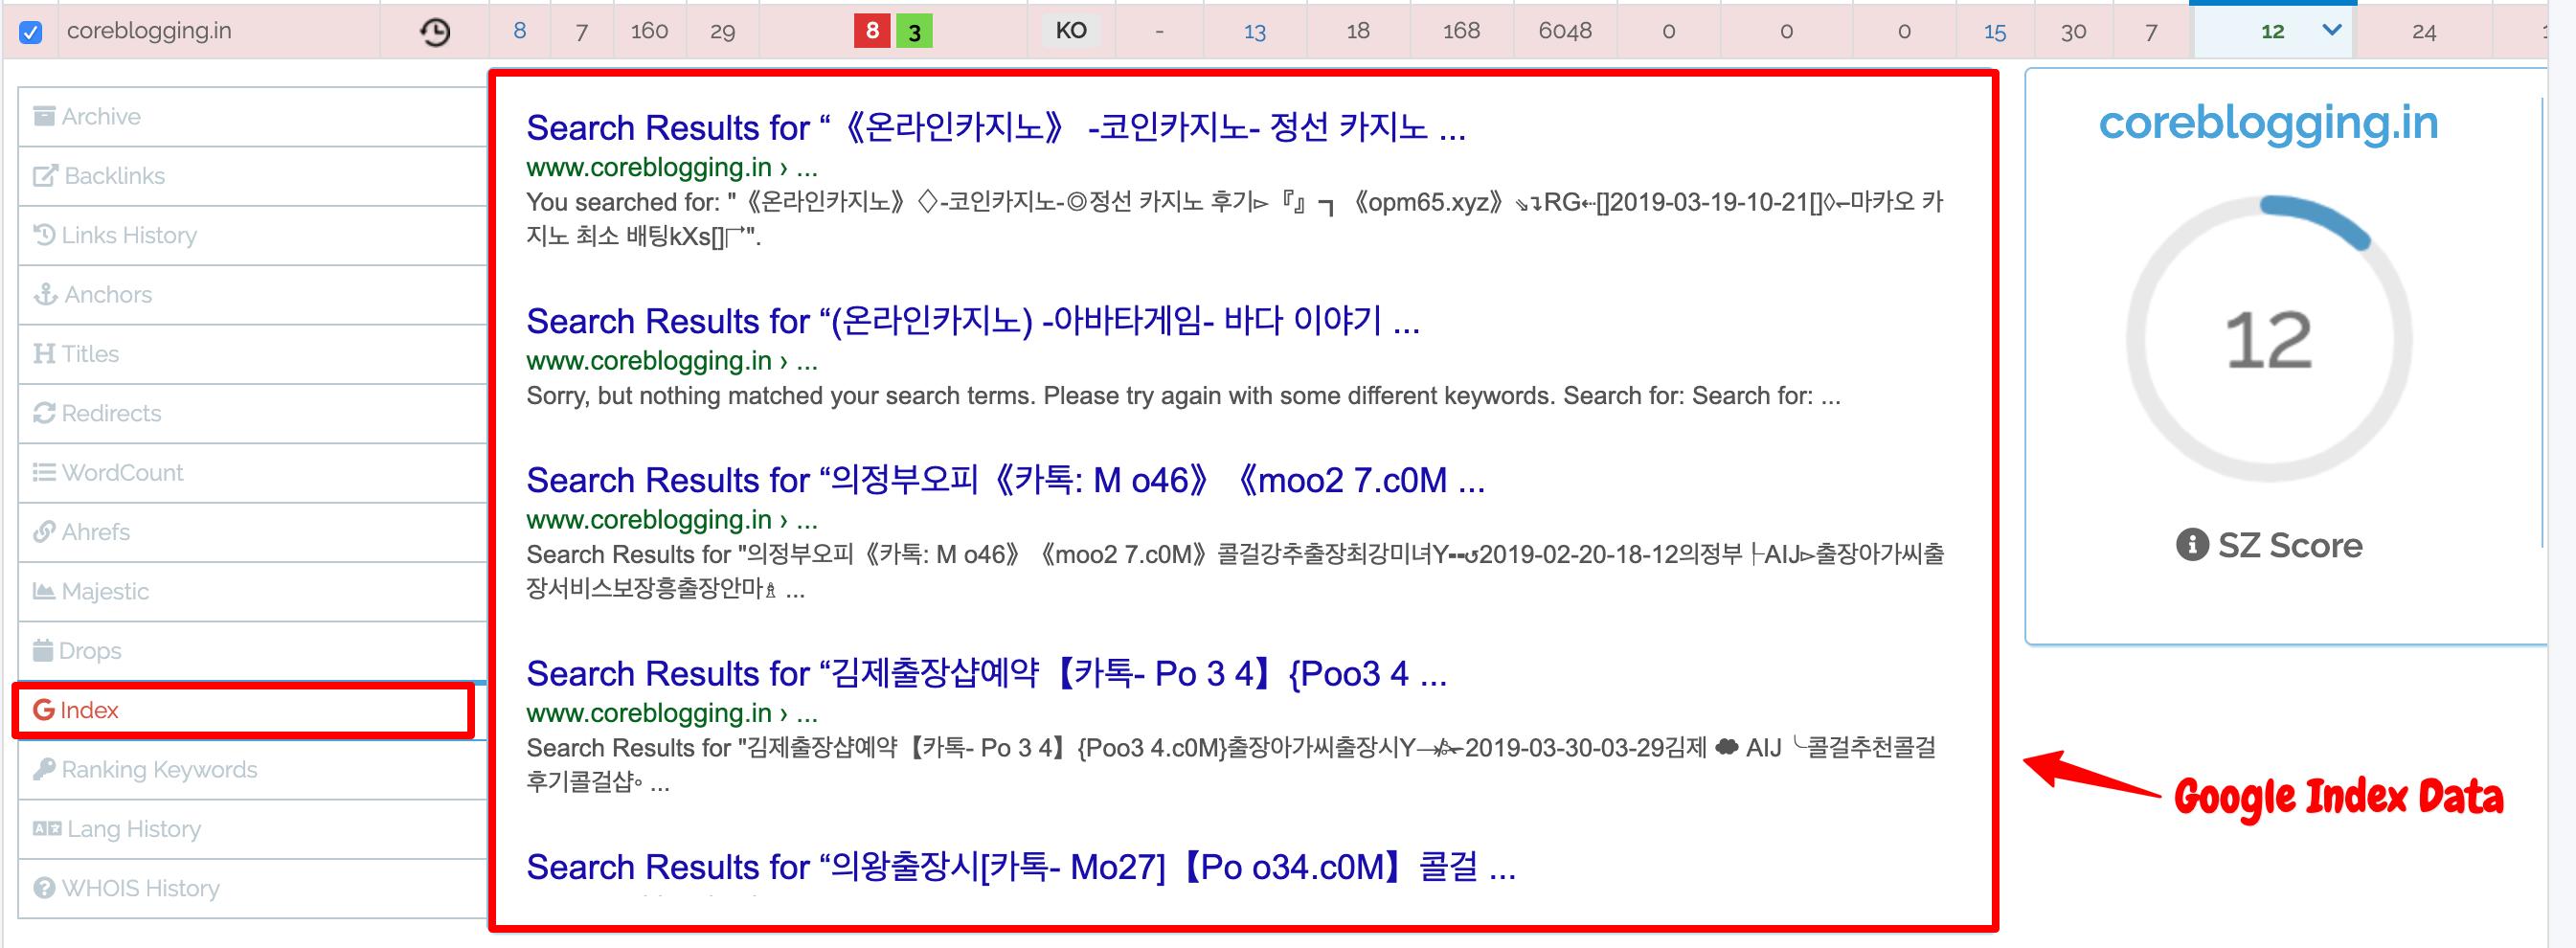 SpamZilla- Google Index Reports